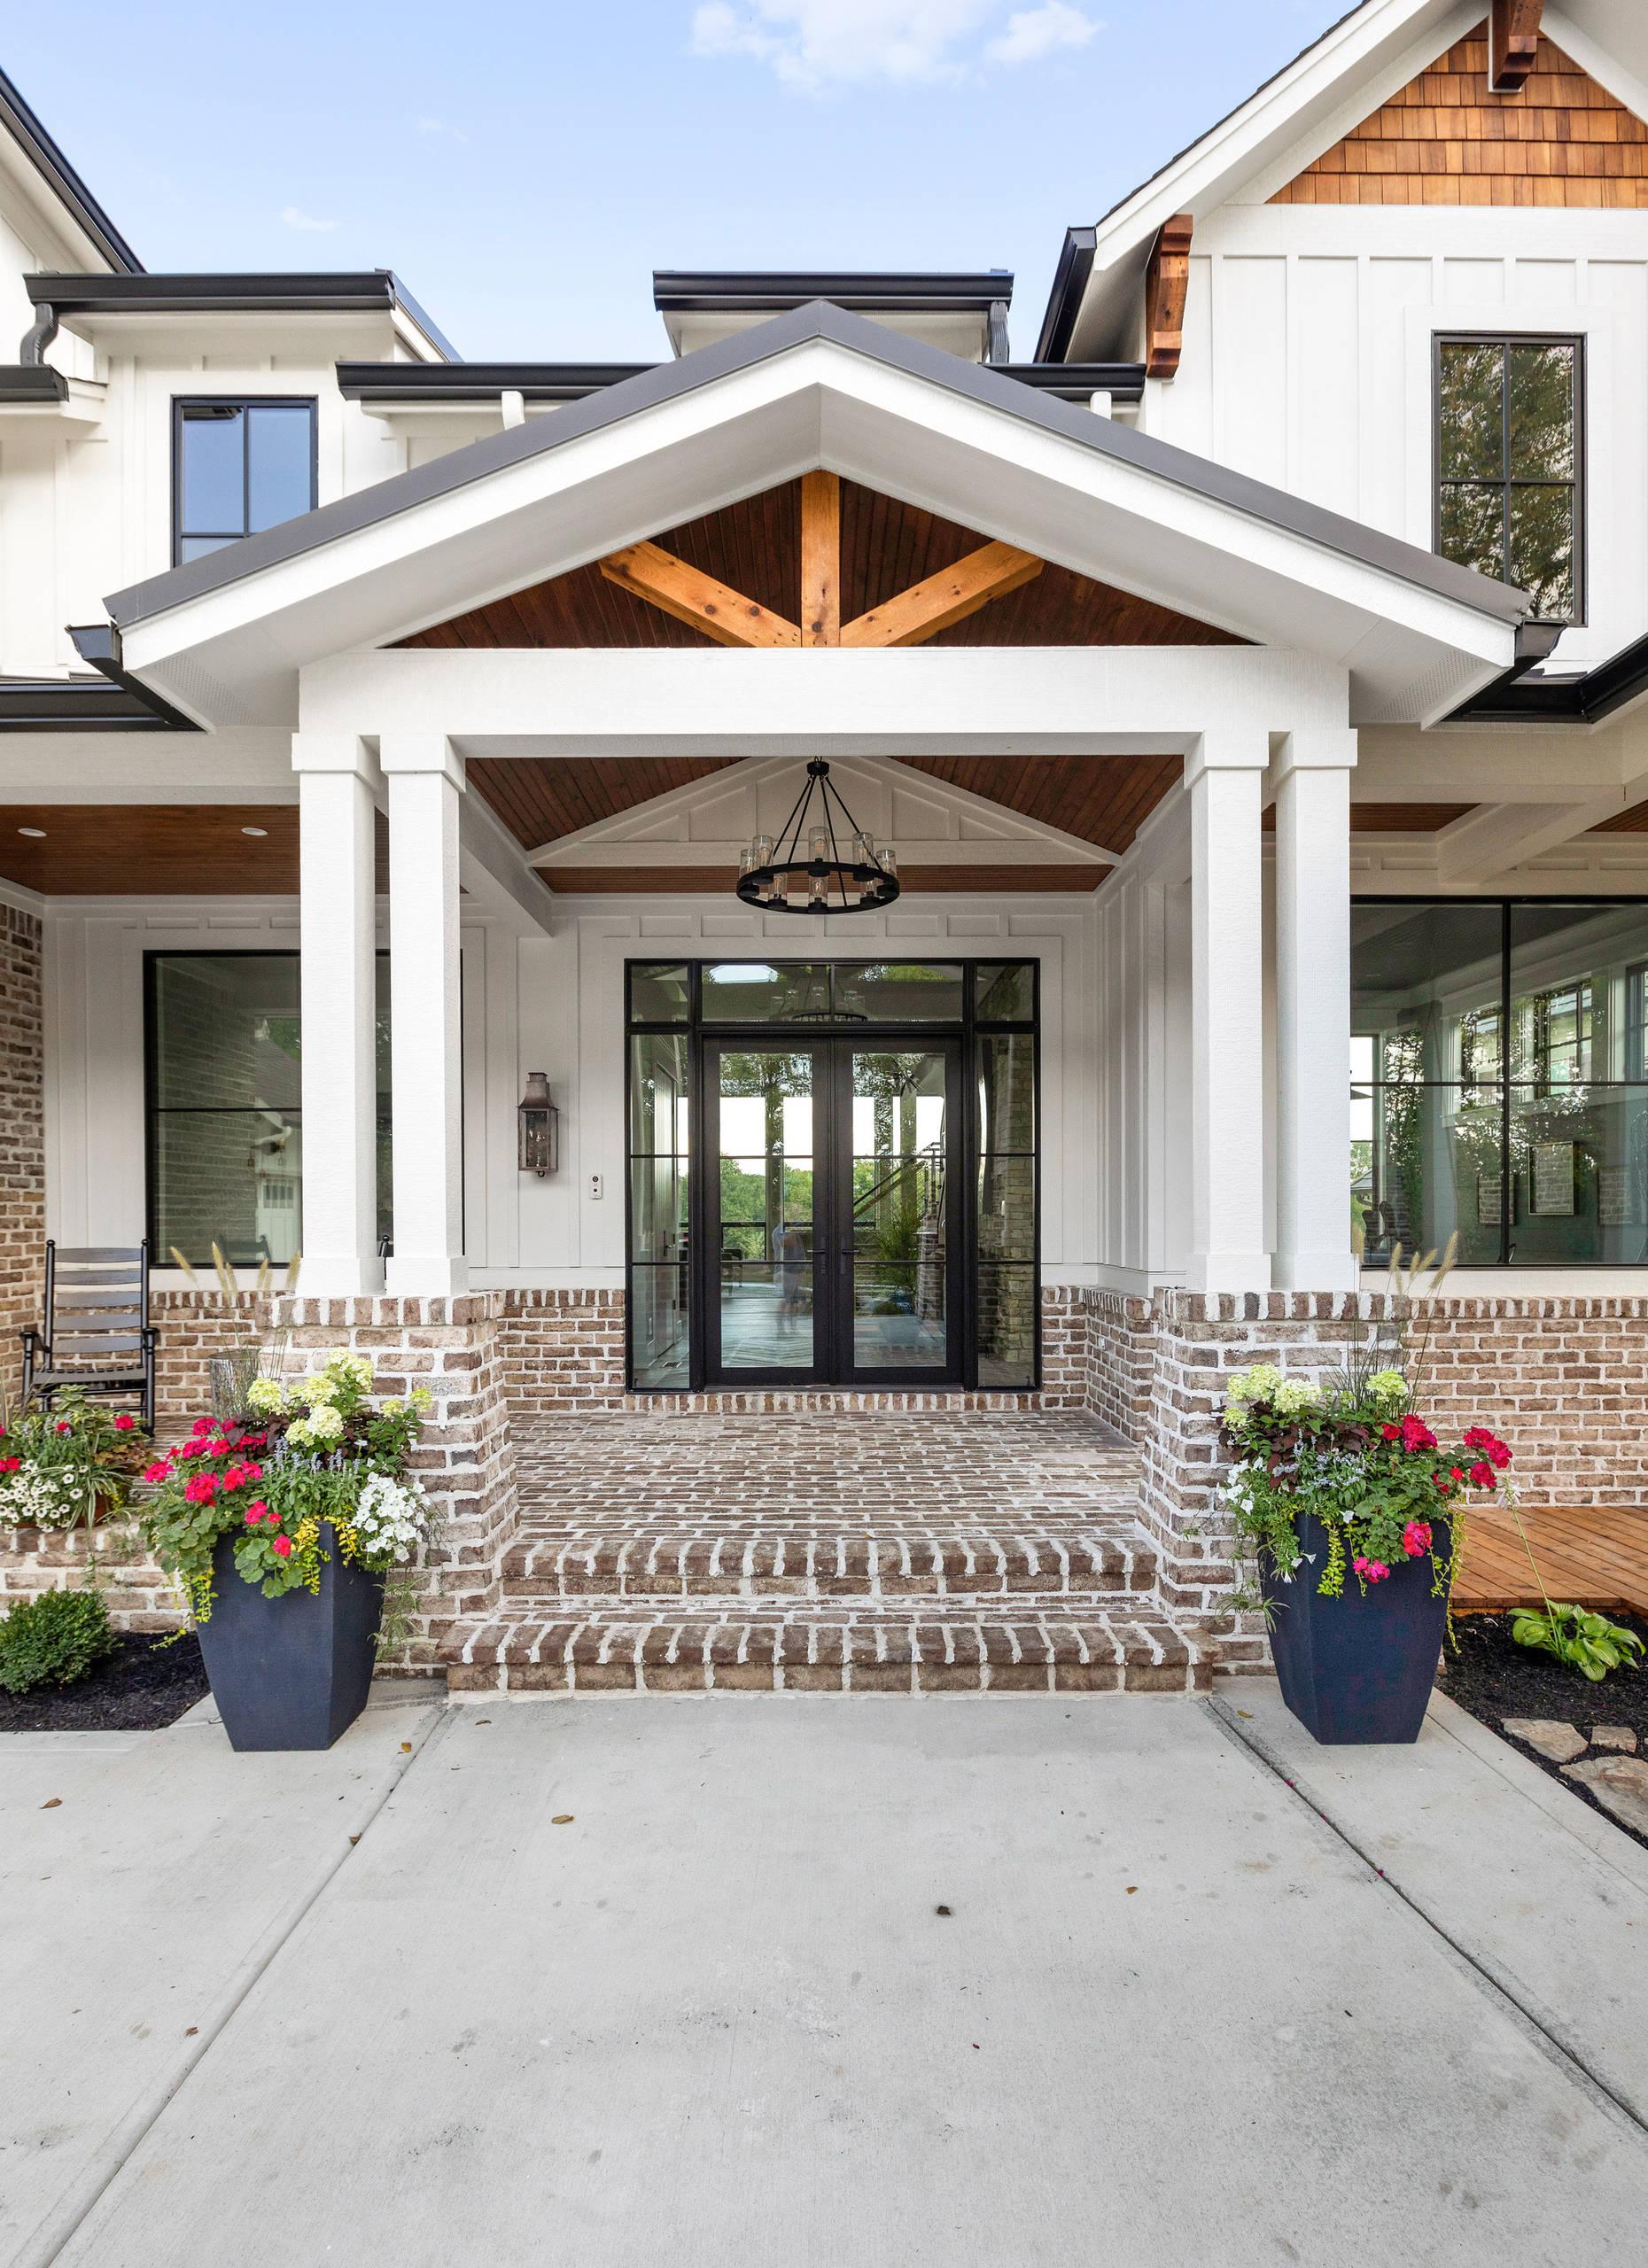 75 Beautiful Farmhouse Exterior Home Pictures Ideas December 2020 Houzz